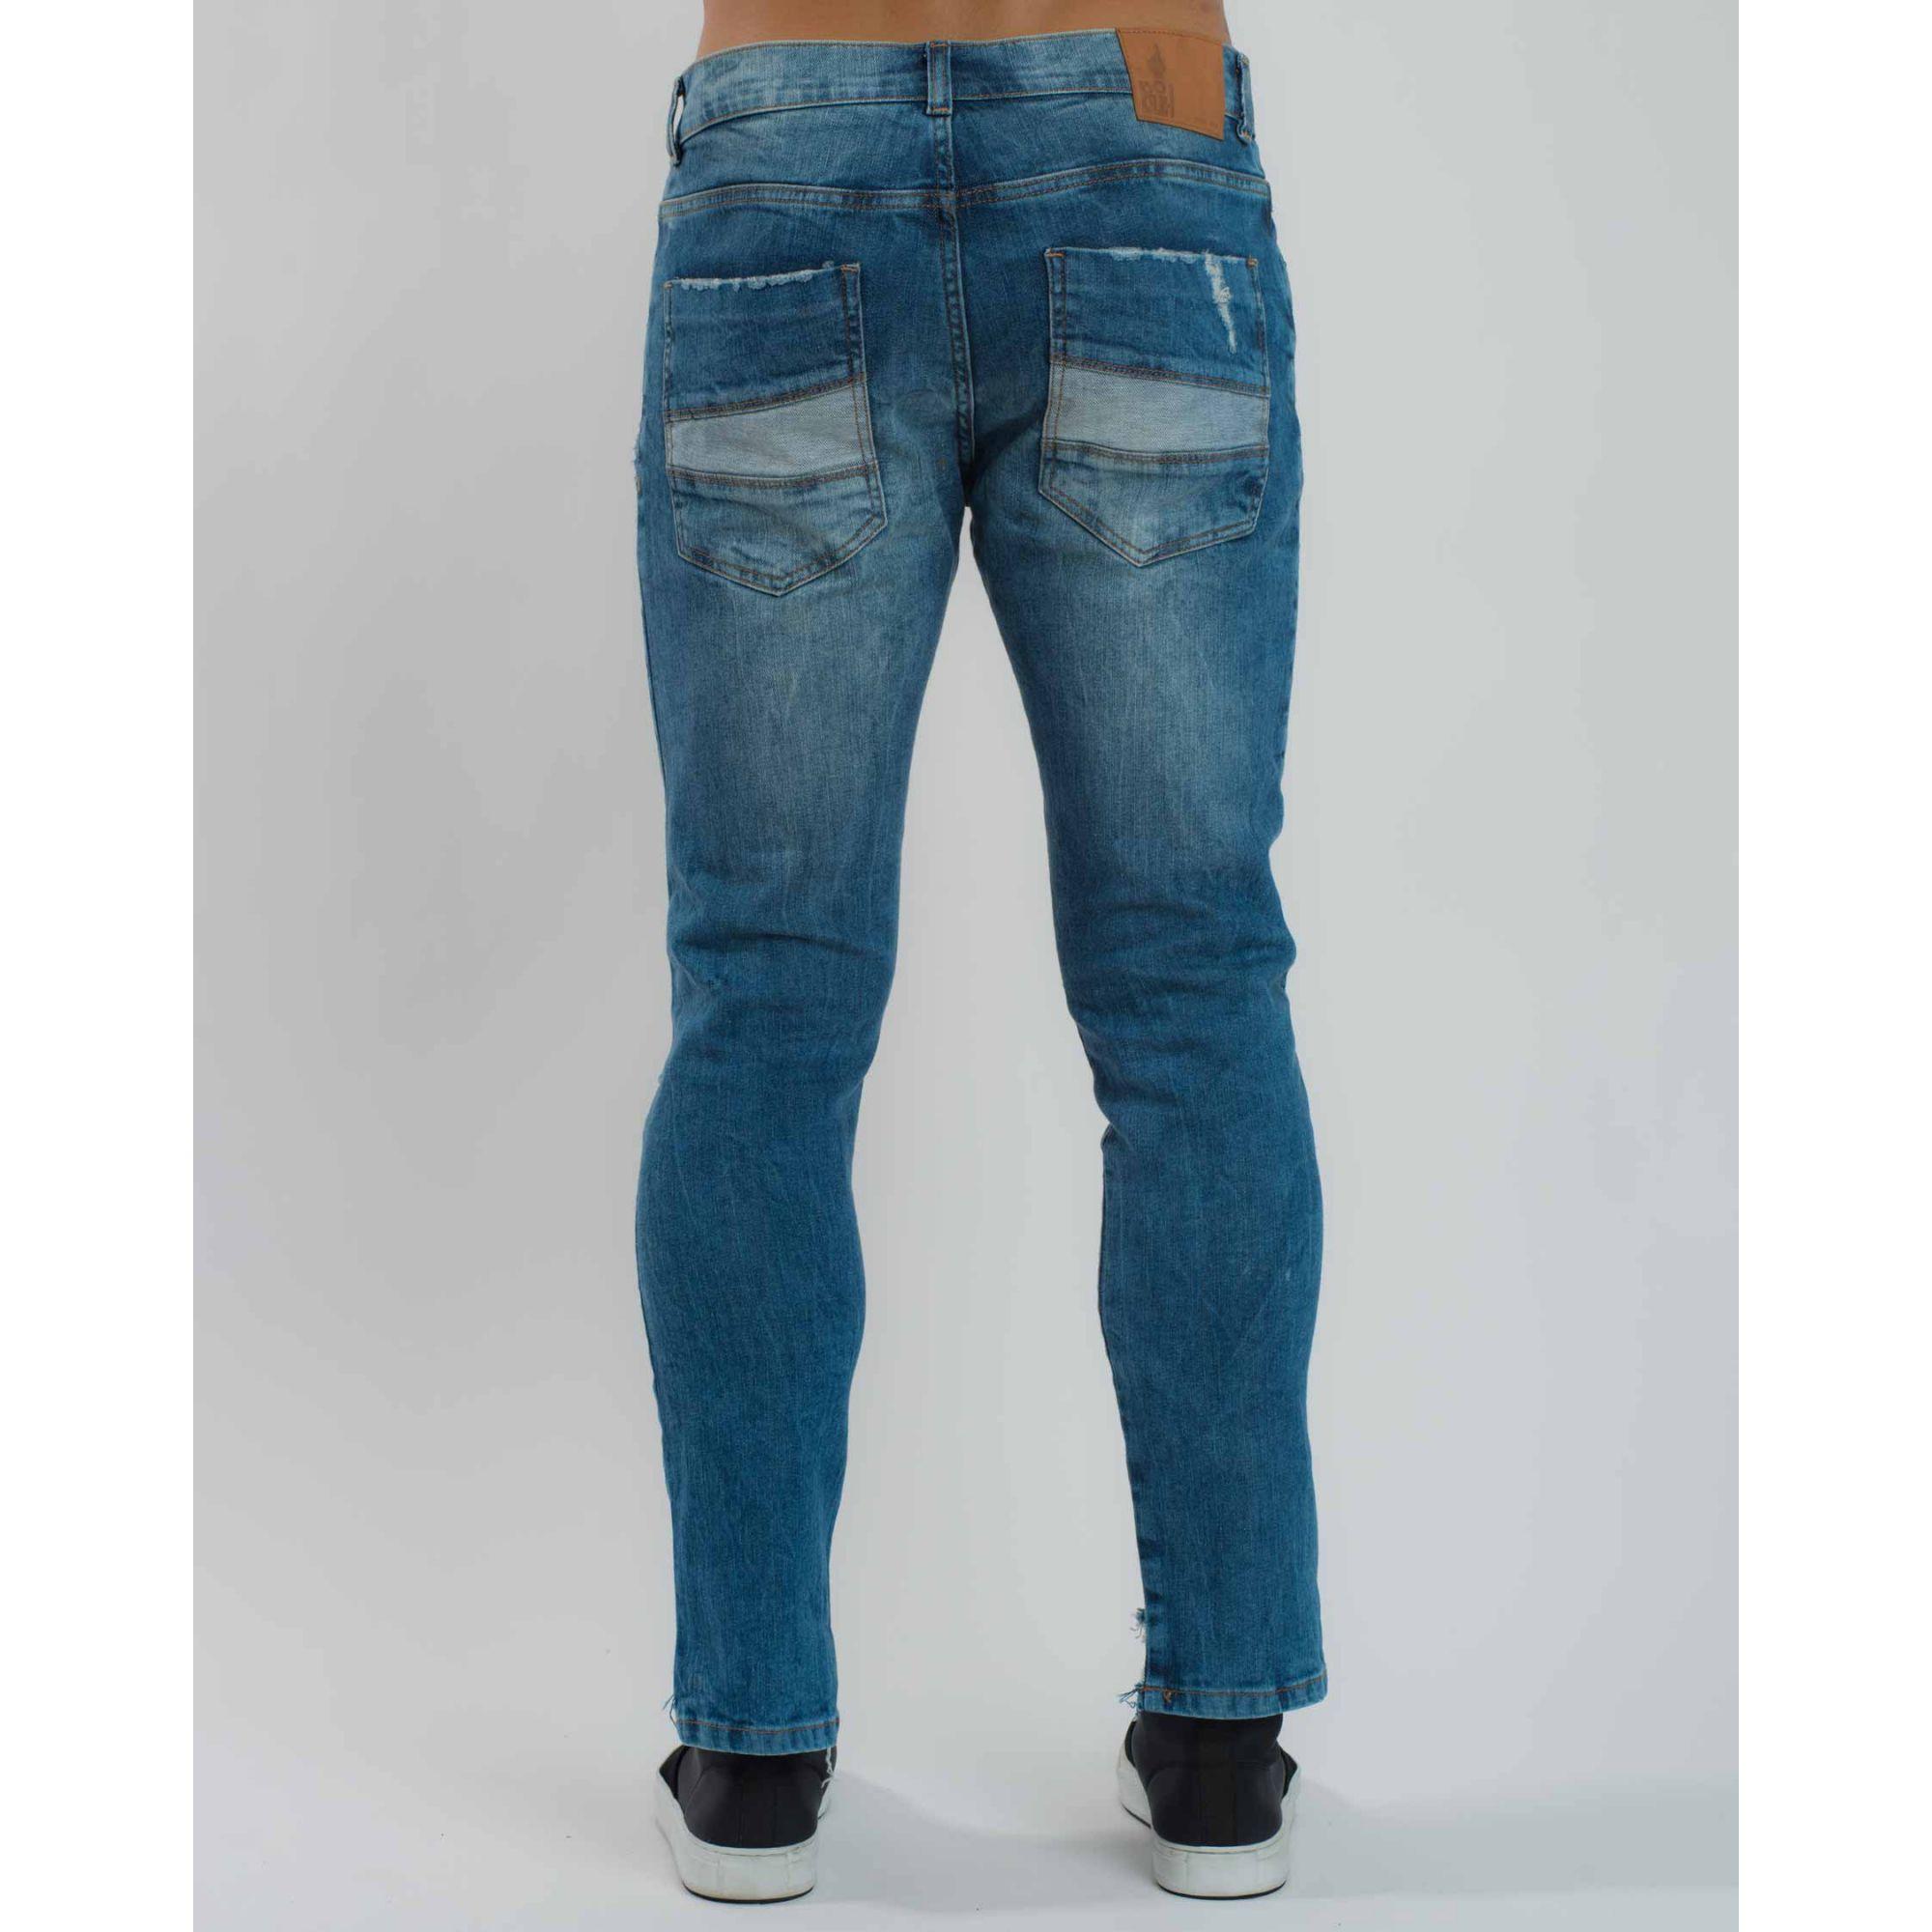 Calça Jeans Ripped Azul Claro